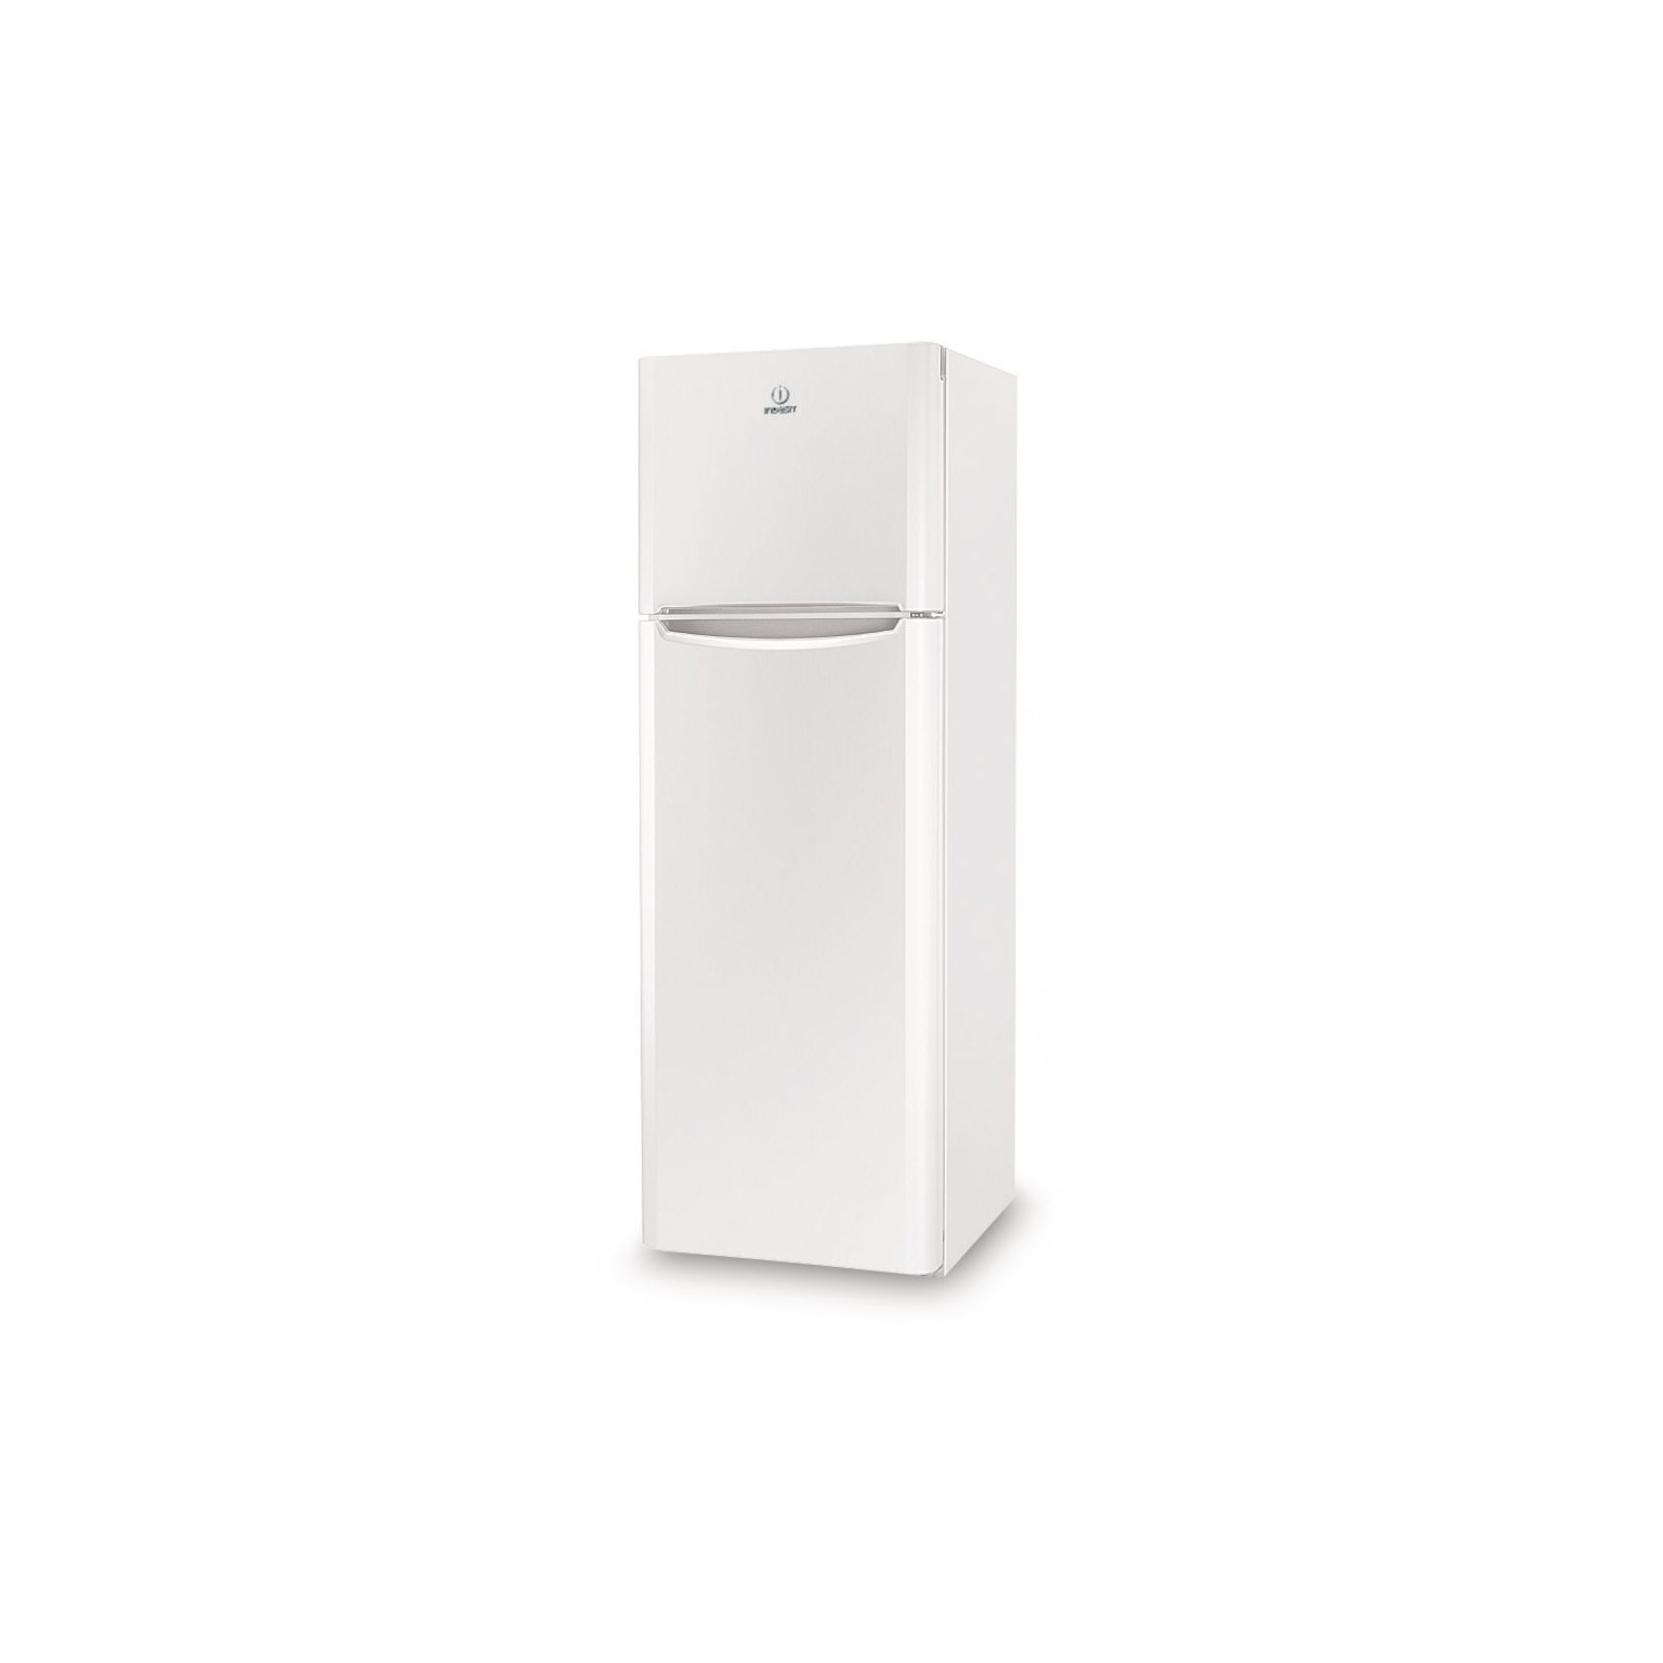 Indesit tiaa12v frigorifero doppia porta 300 lt vent classe a bianco garanzia italia - Frigoriferi doppia porta classe a ...